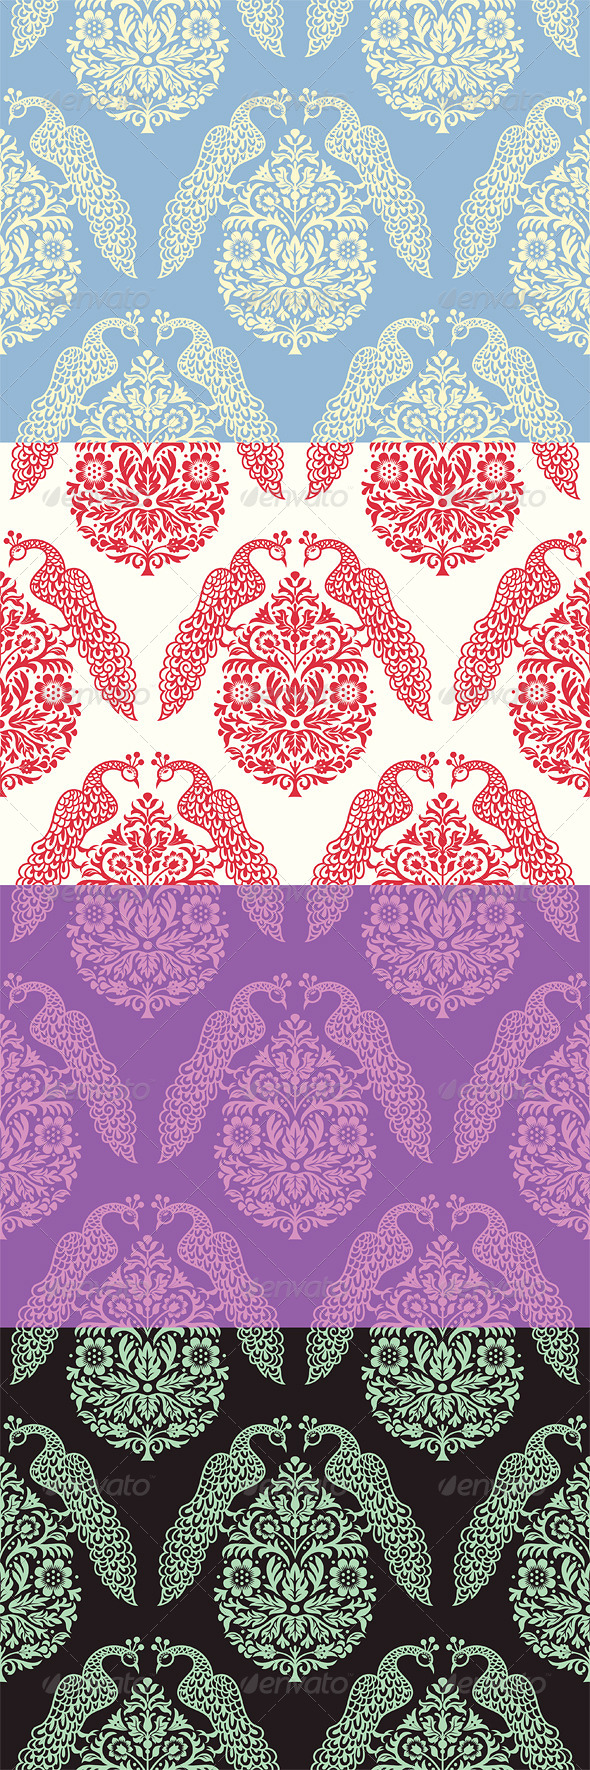 Birds On Tree Seamless Pattern - Patterns Decorative